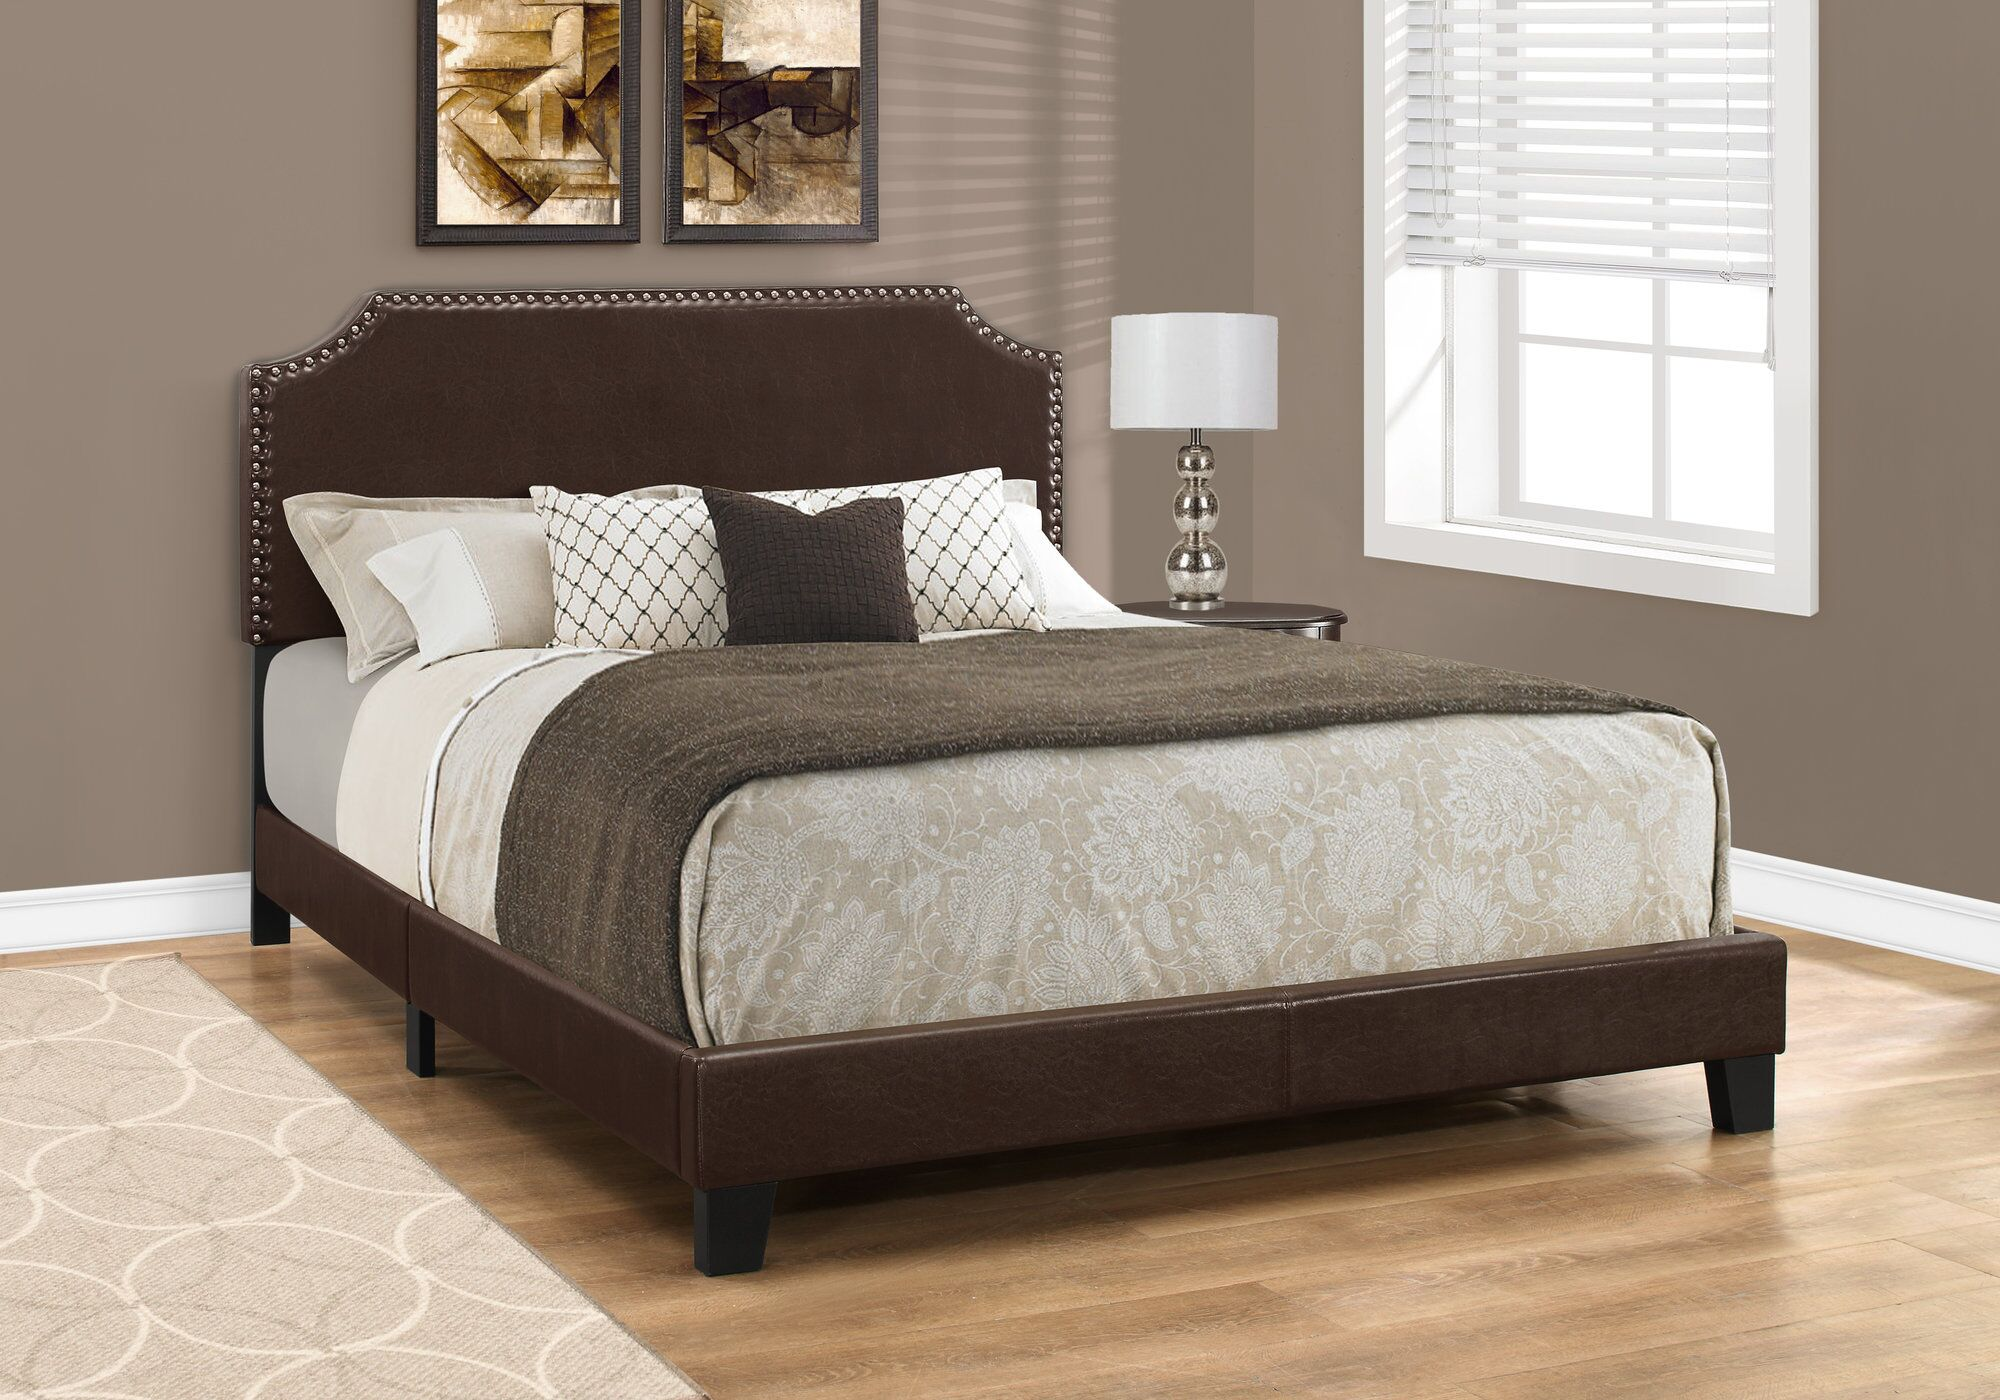 Dugas Queen Upholstered Panel Bed